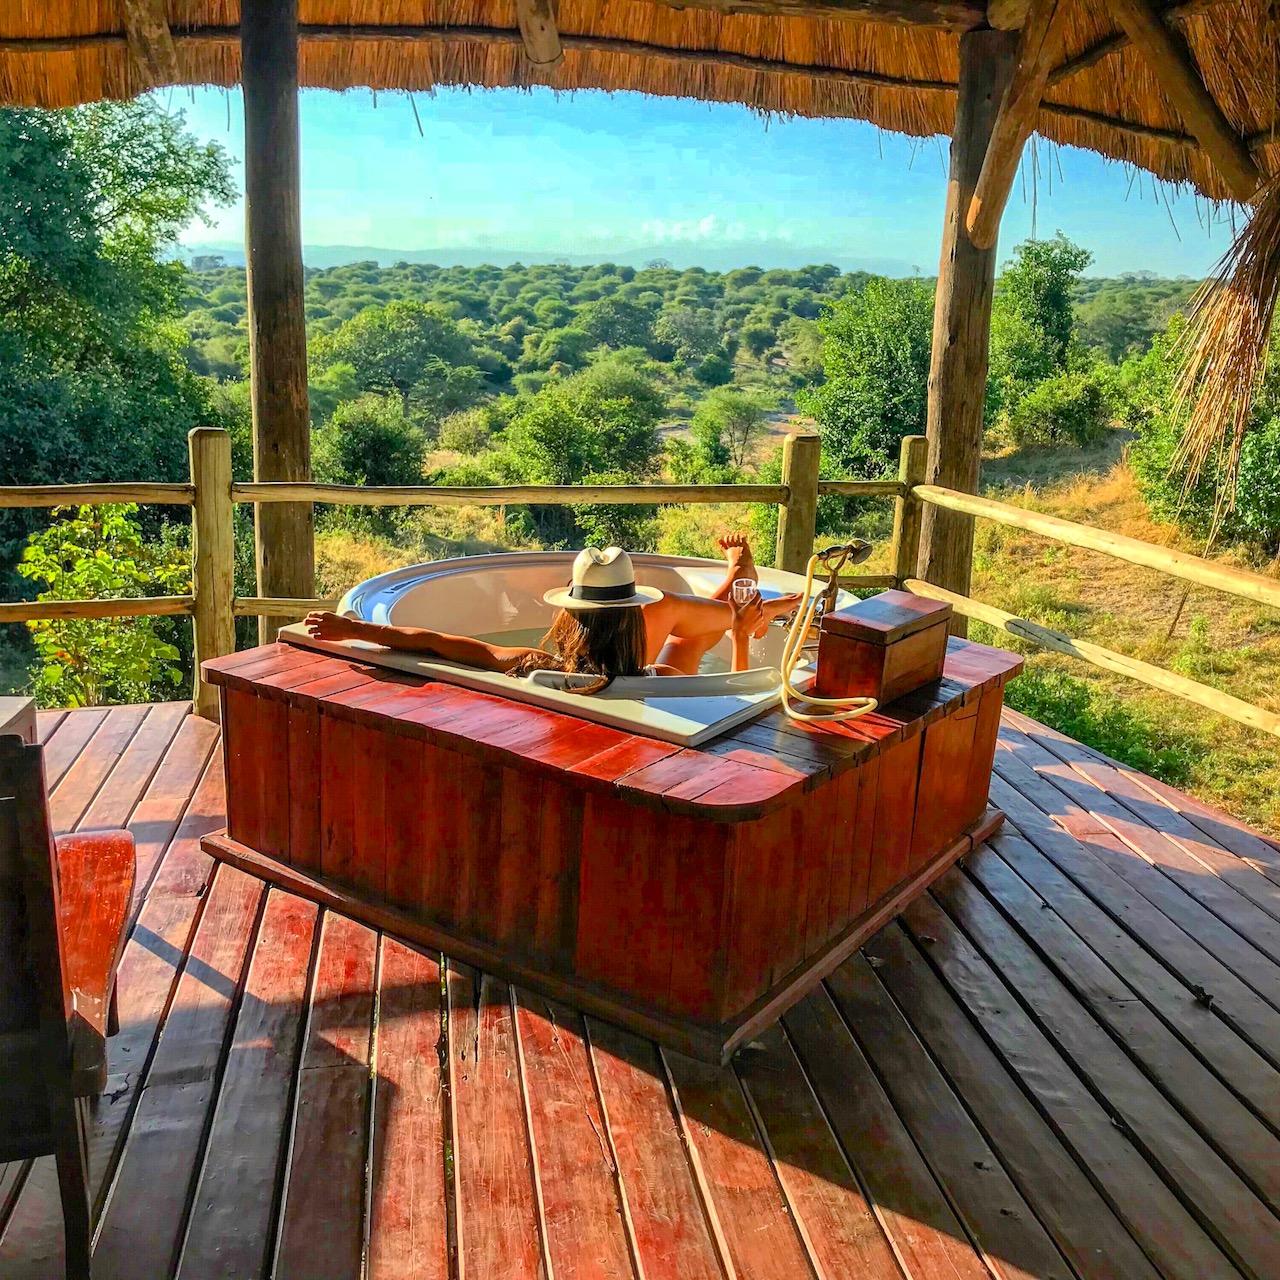 East Africa Safari Tarangire River Camp